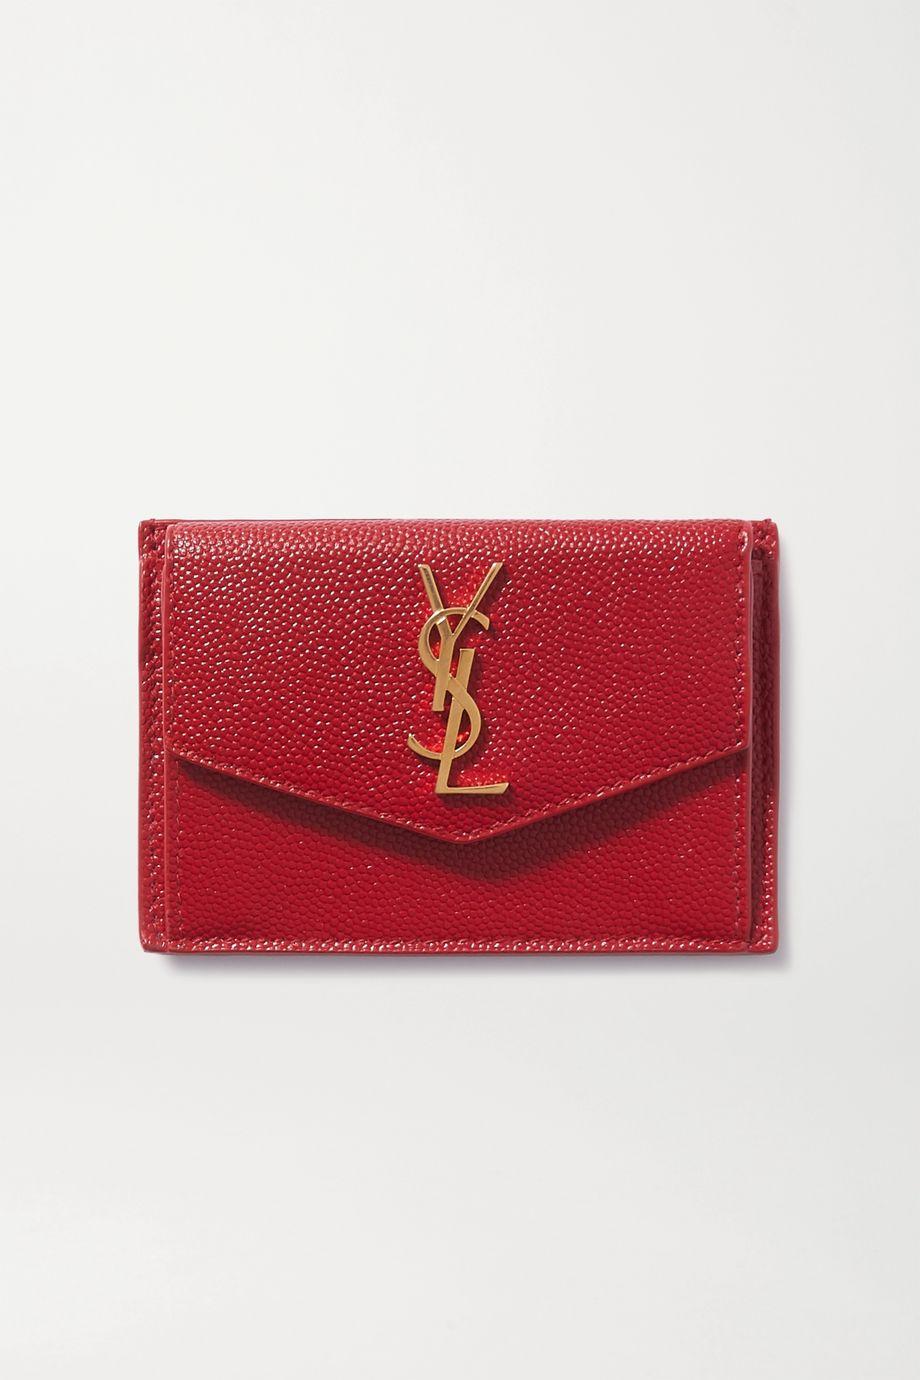 SAINT LAURENT Uptown textured-leather cardholder